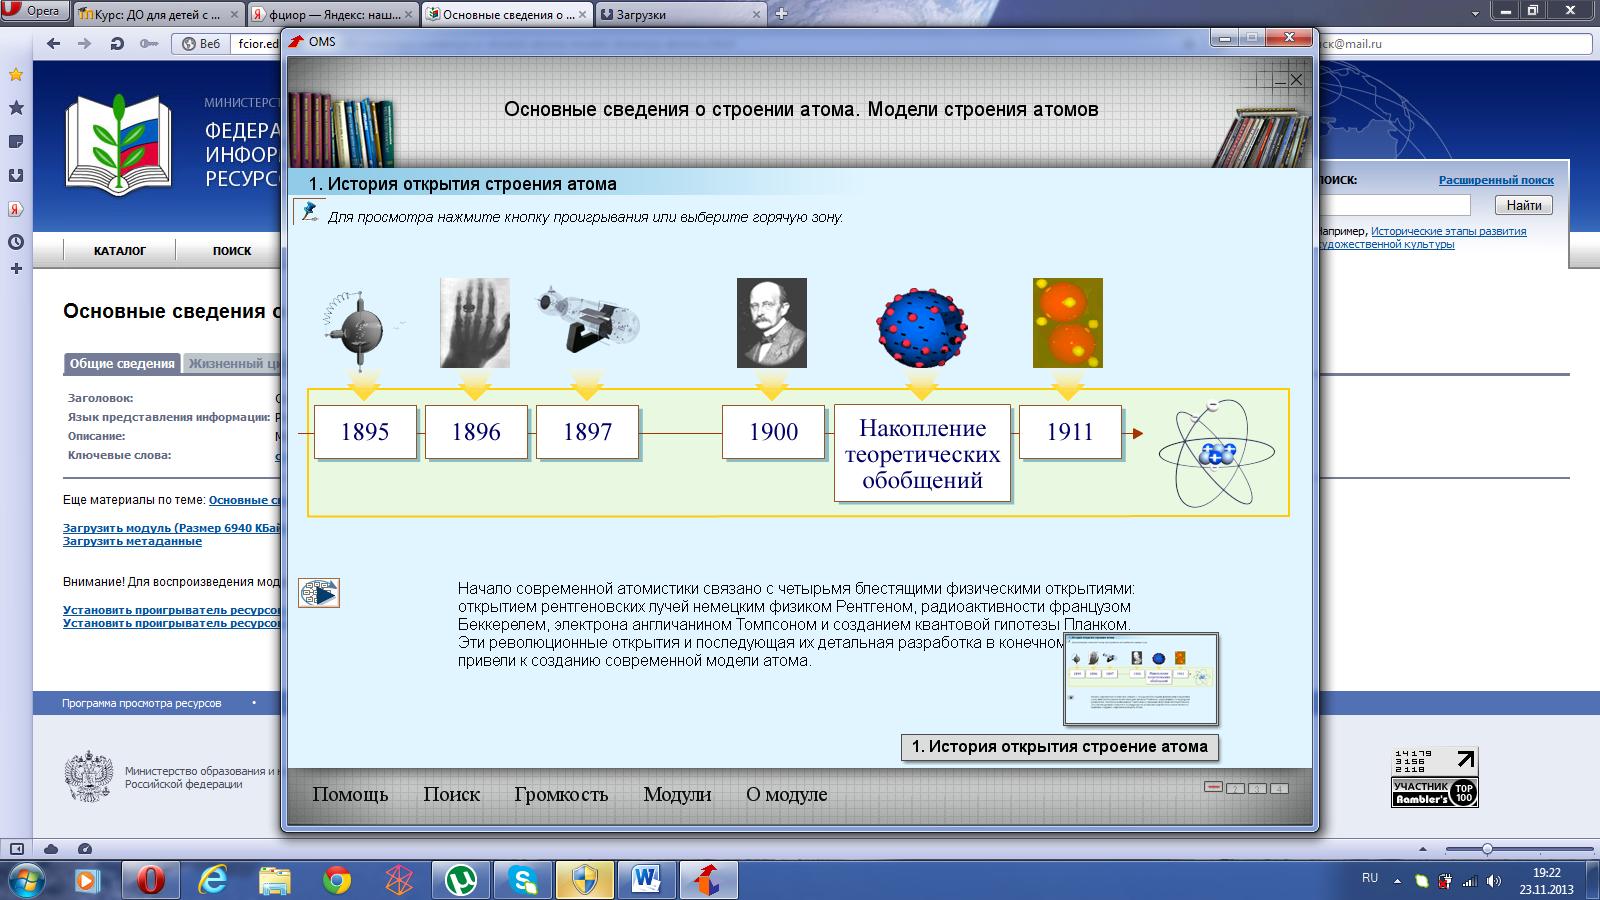 C:\Users\Денис\Pictures\строение атома.png